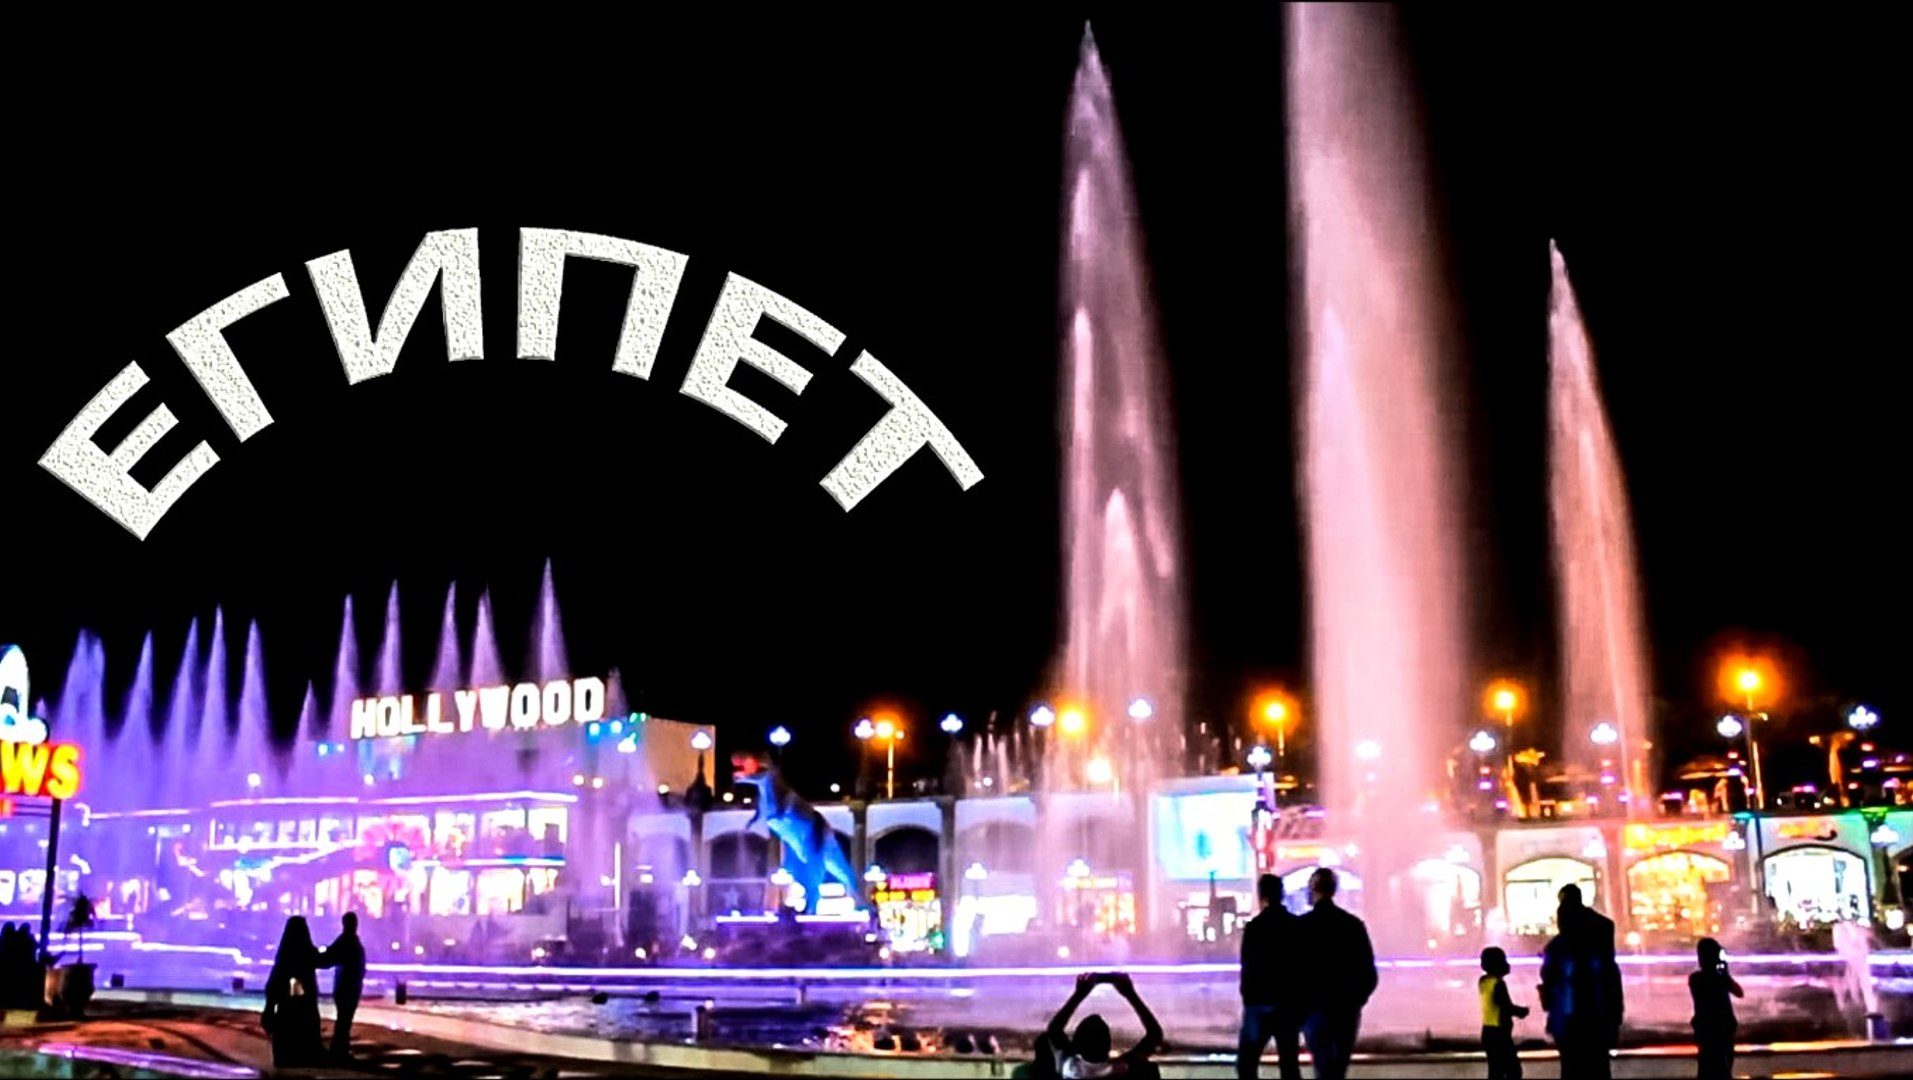 Eгипет Поющий фонтан / Egypt Park Hollywood